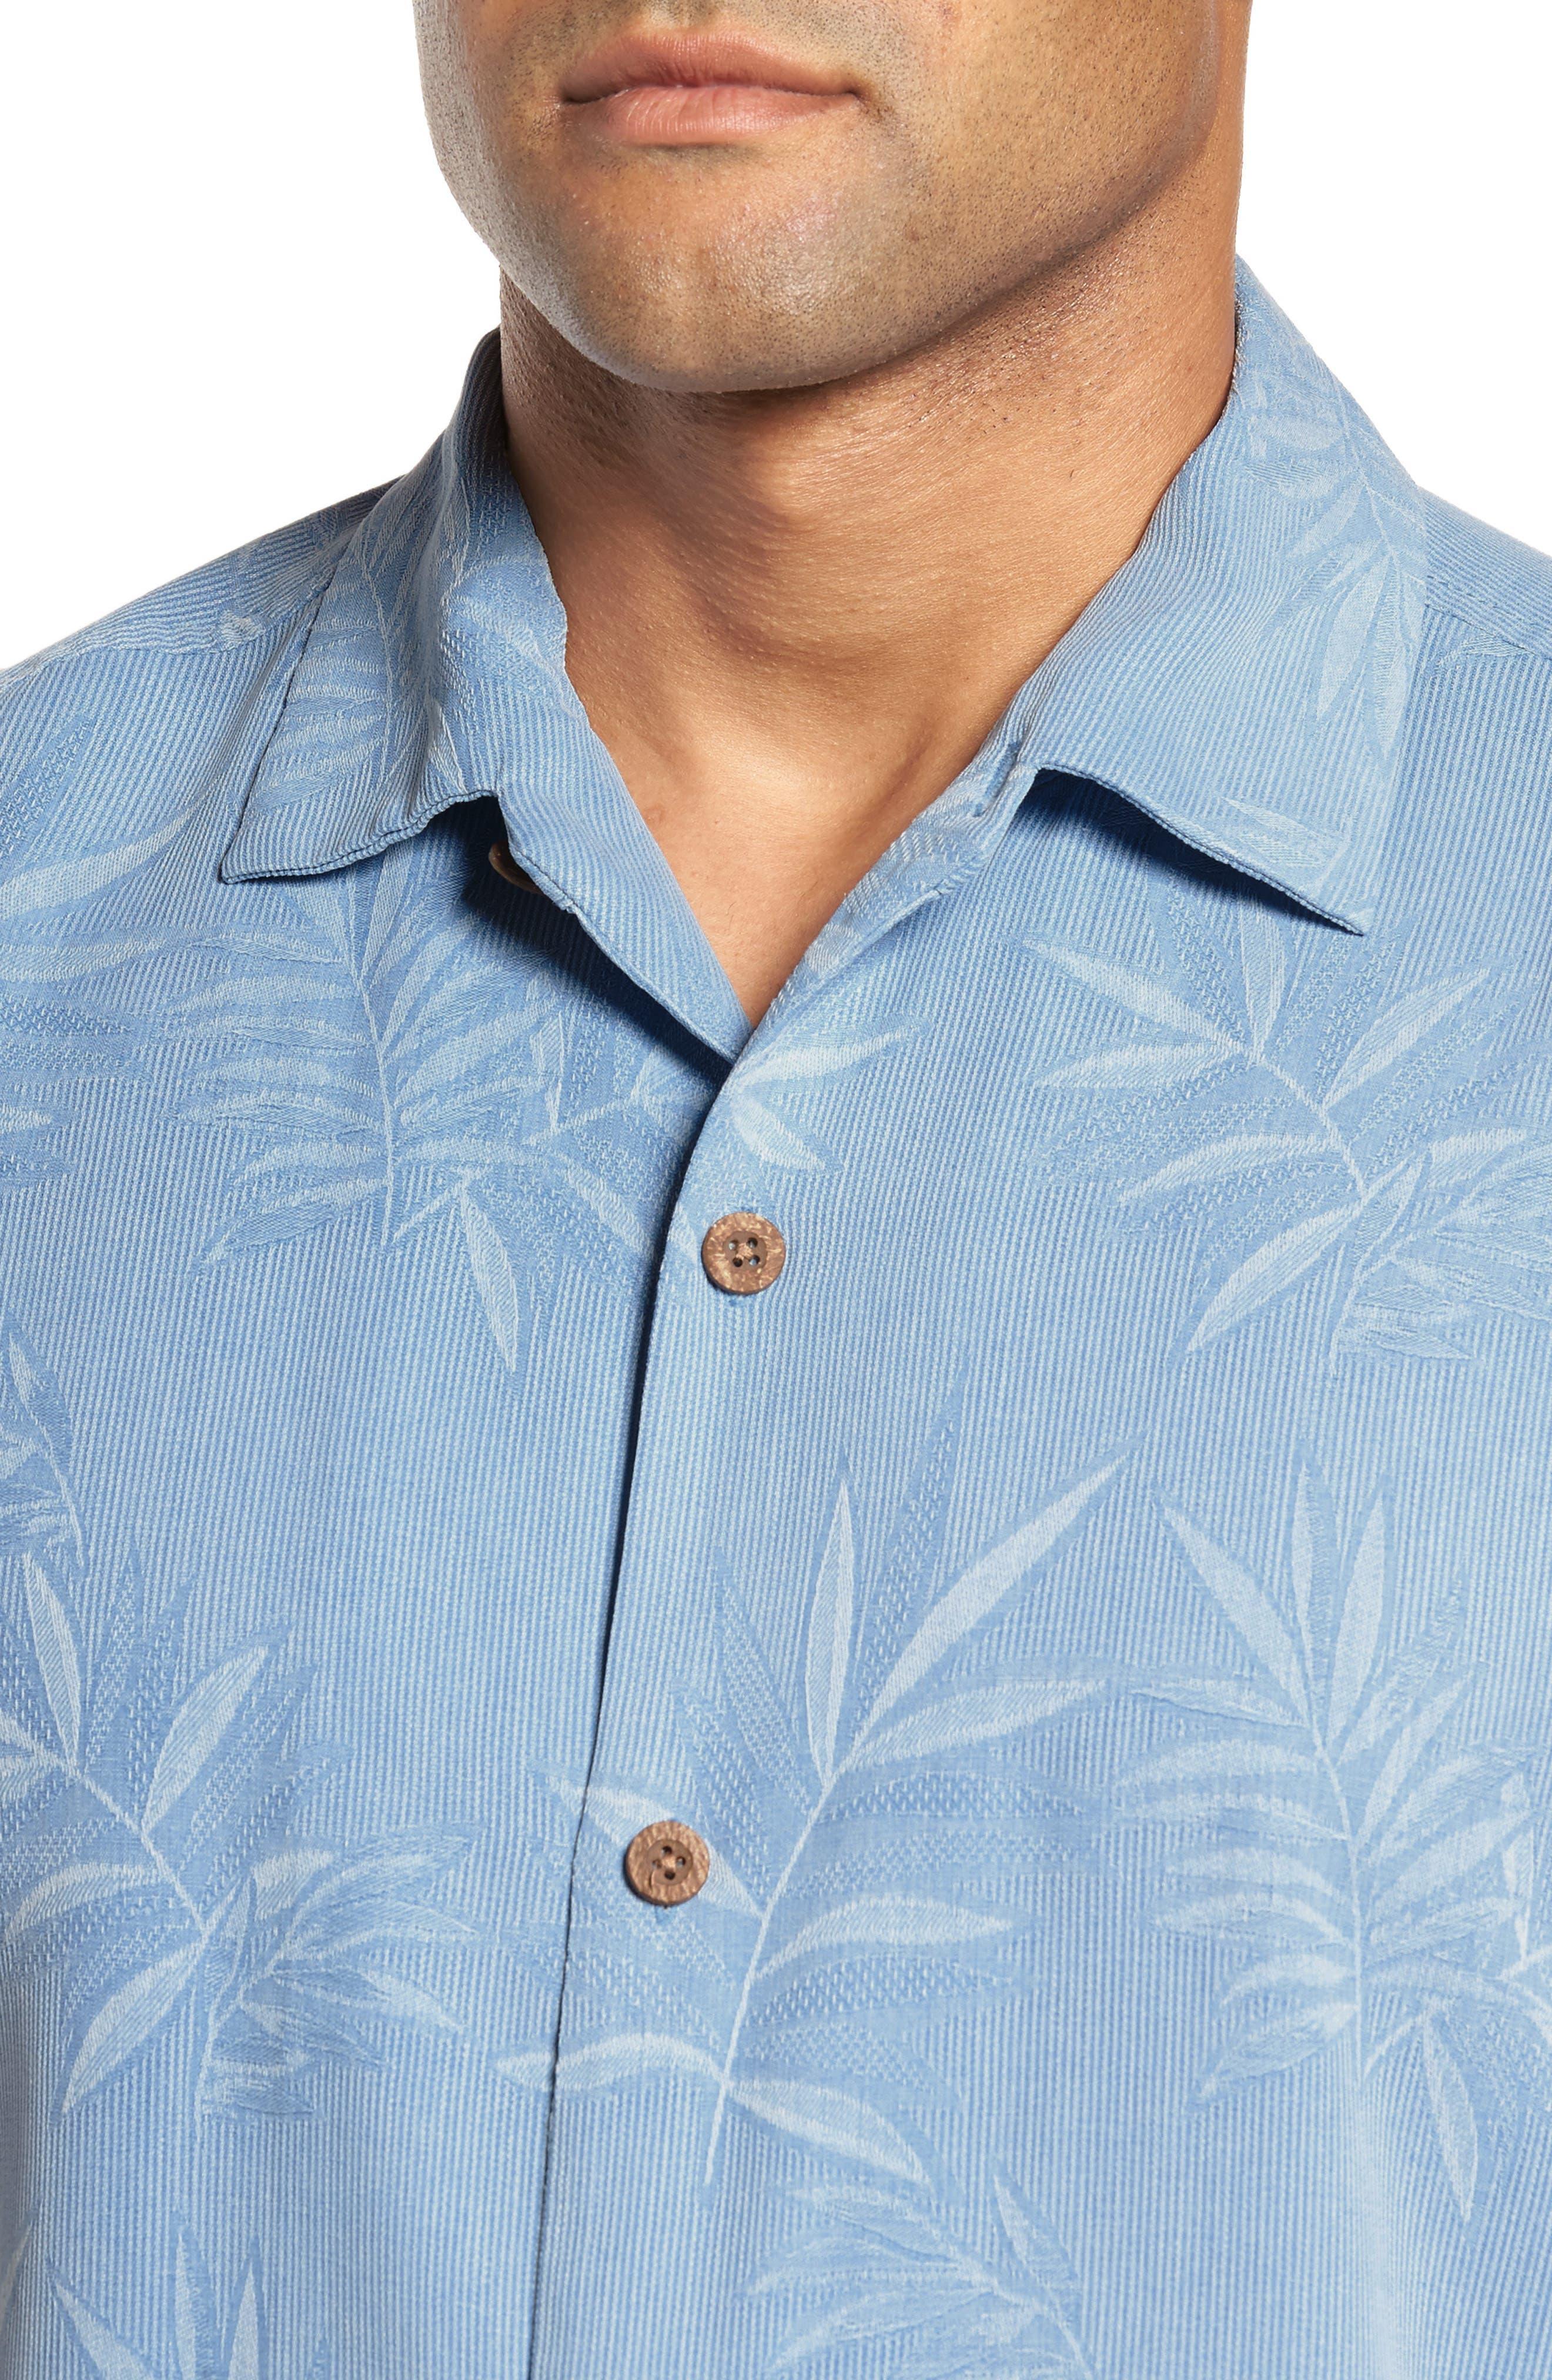 Luau Floral Silk Shirt,                             Alternate thumbnail 4, color,                             LIGHT SKY